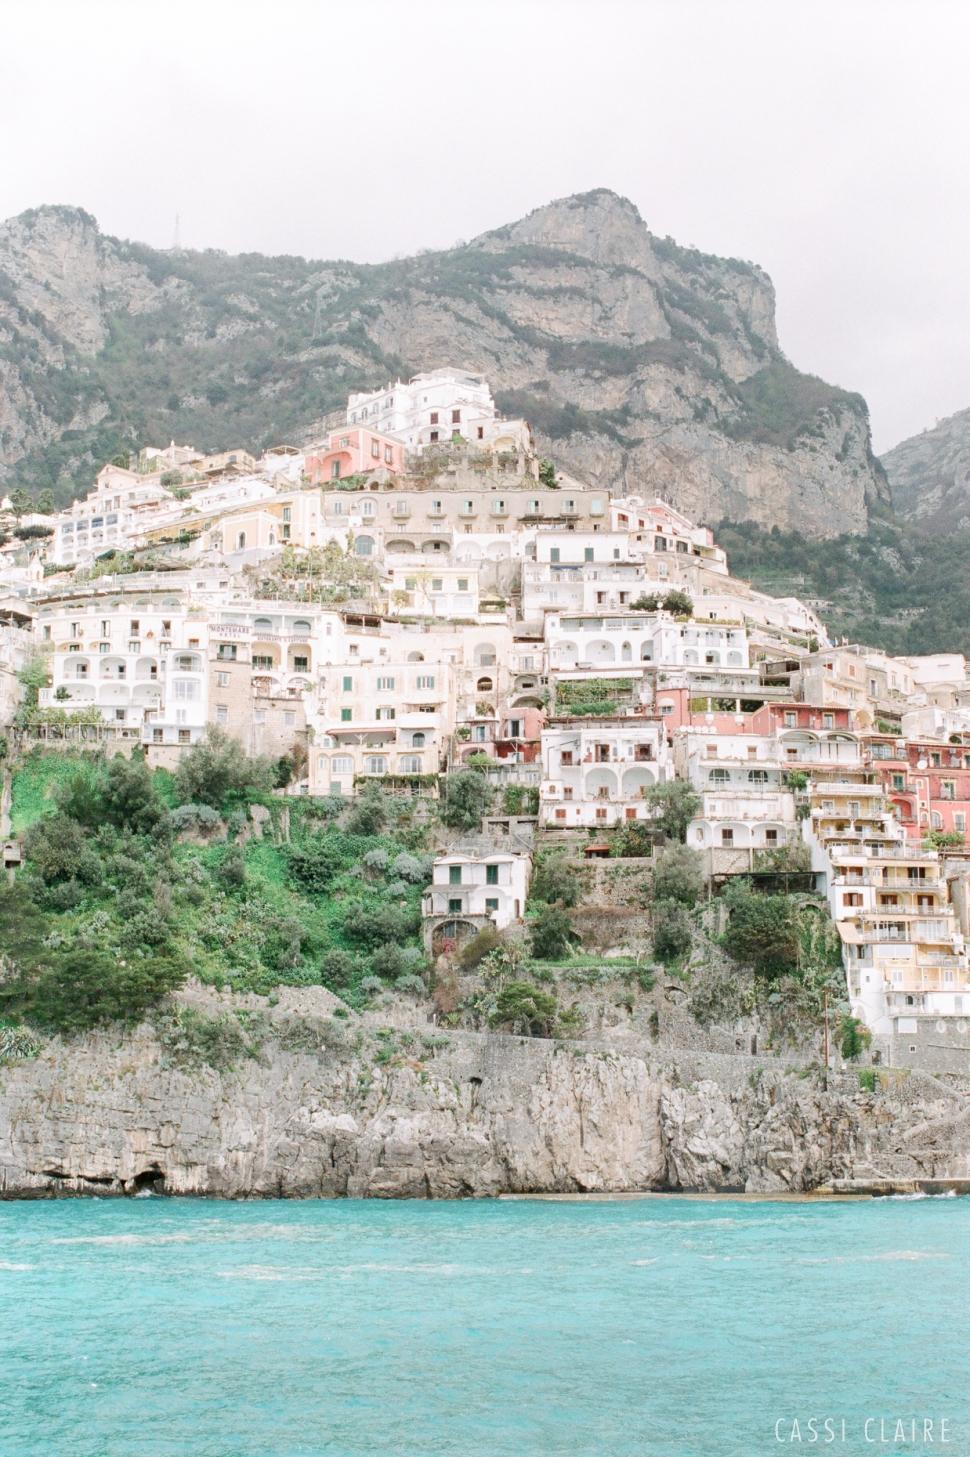 Positano-Anniversary-Photos_CassiClaire_30.jpg